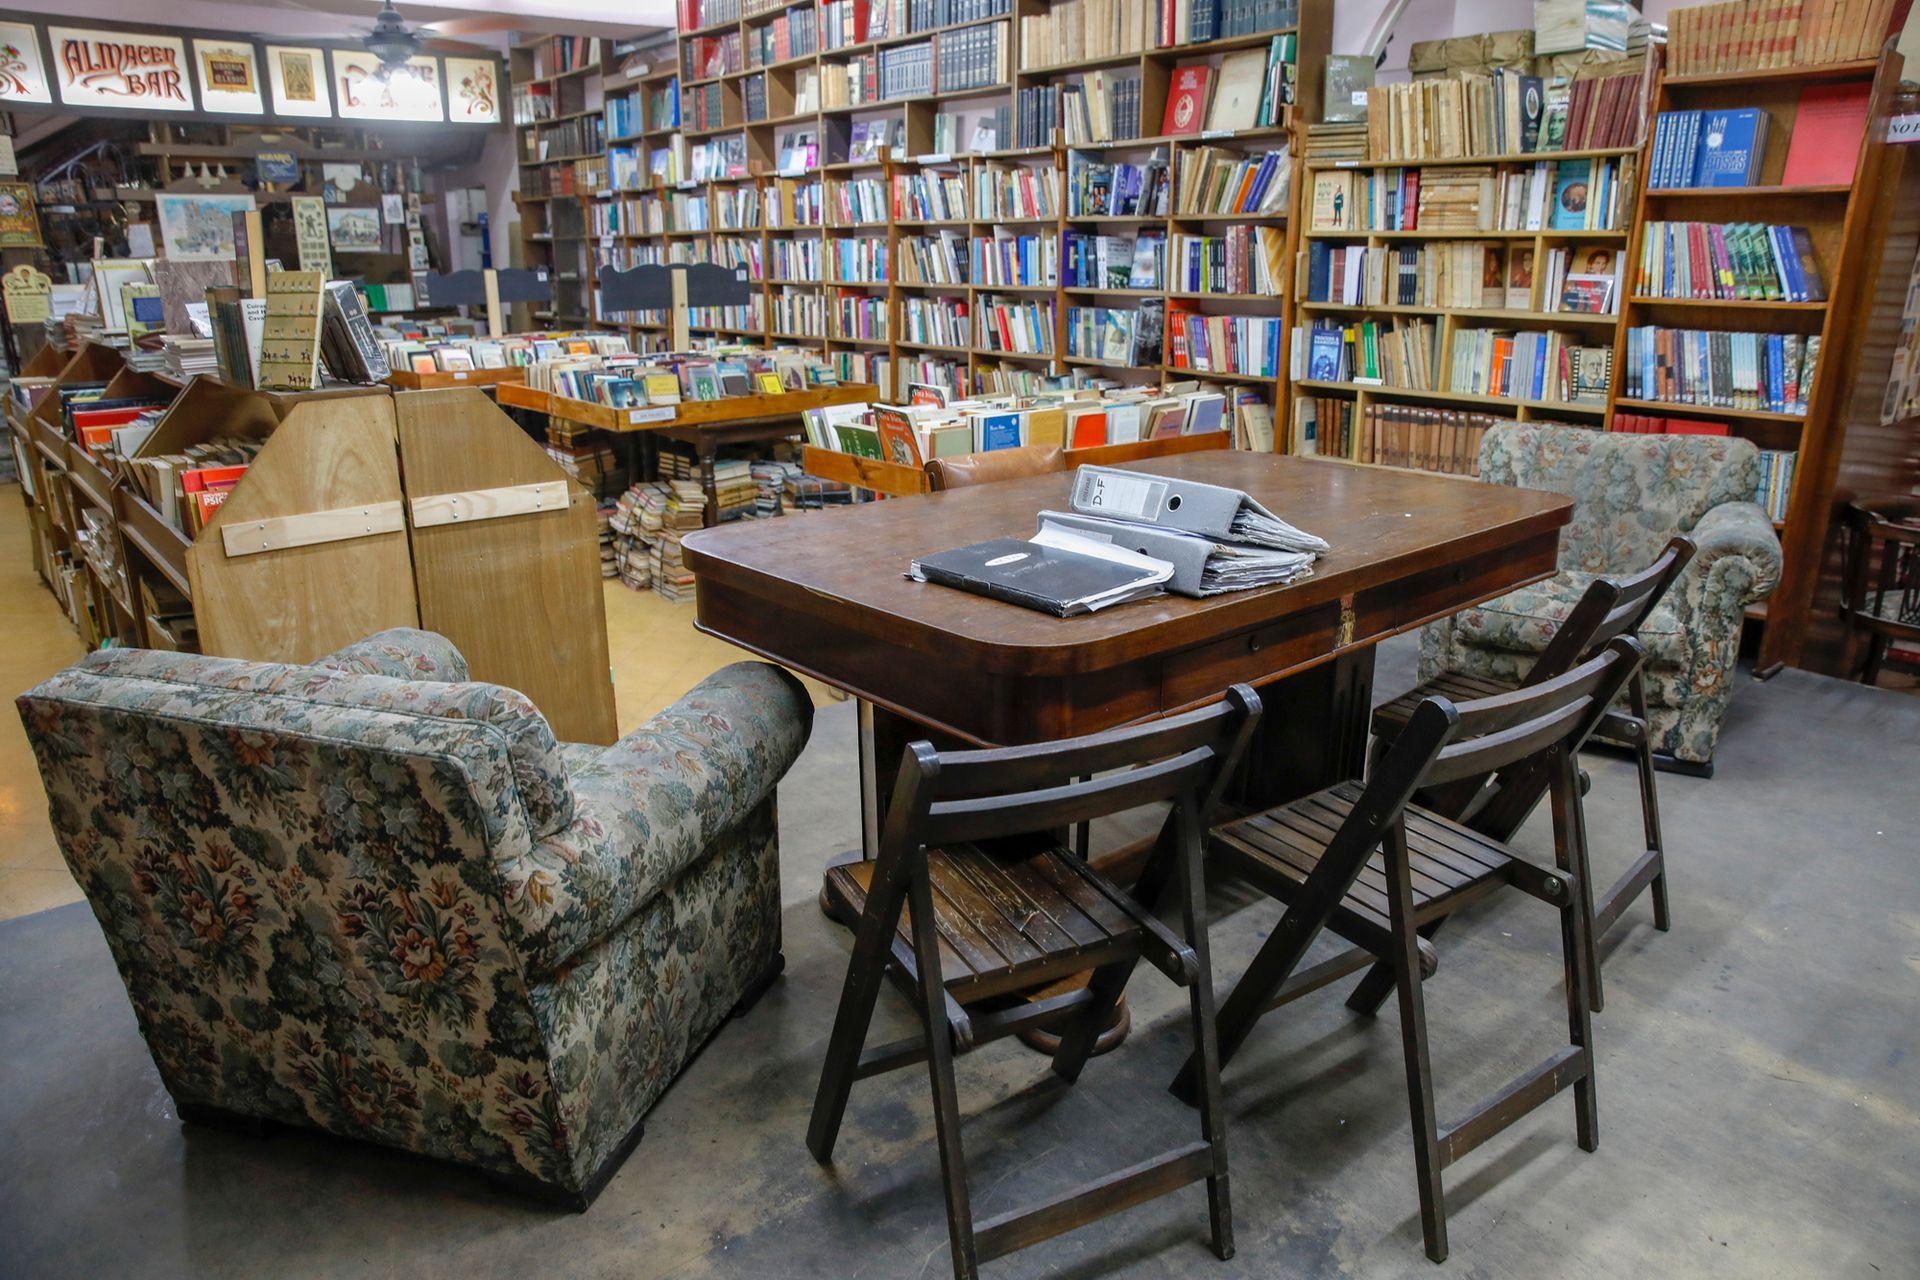 Antiguos sillones para sentarse a leer